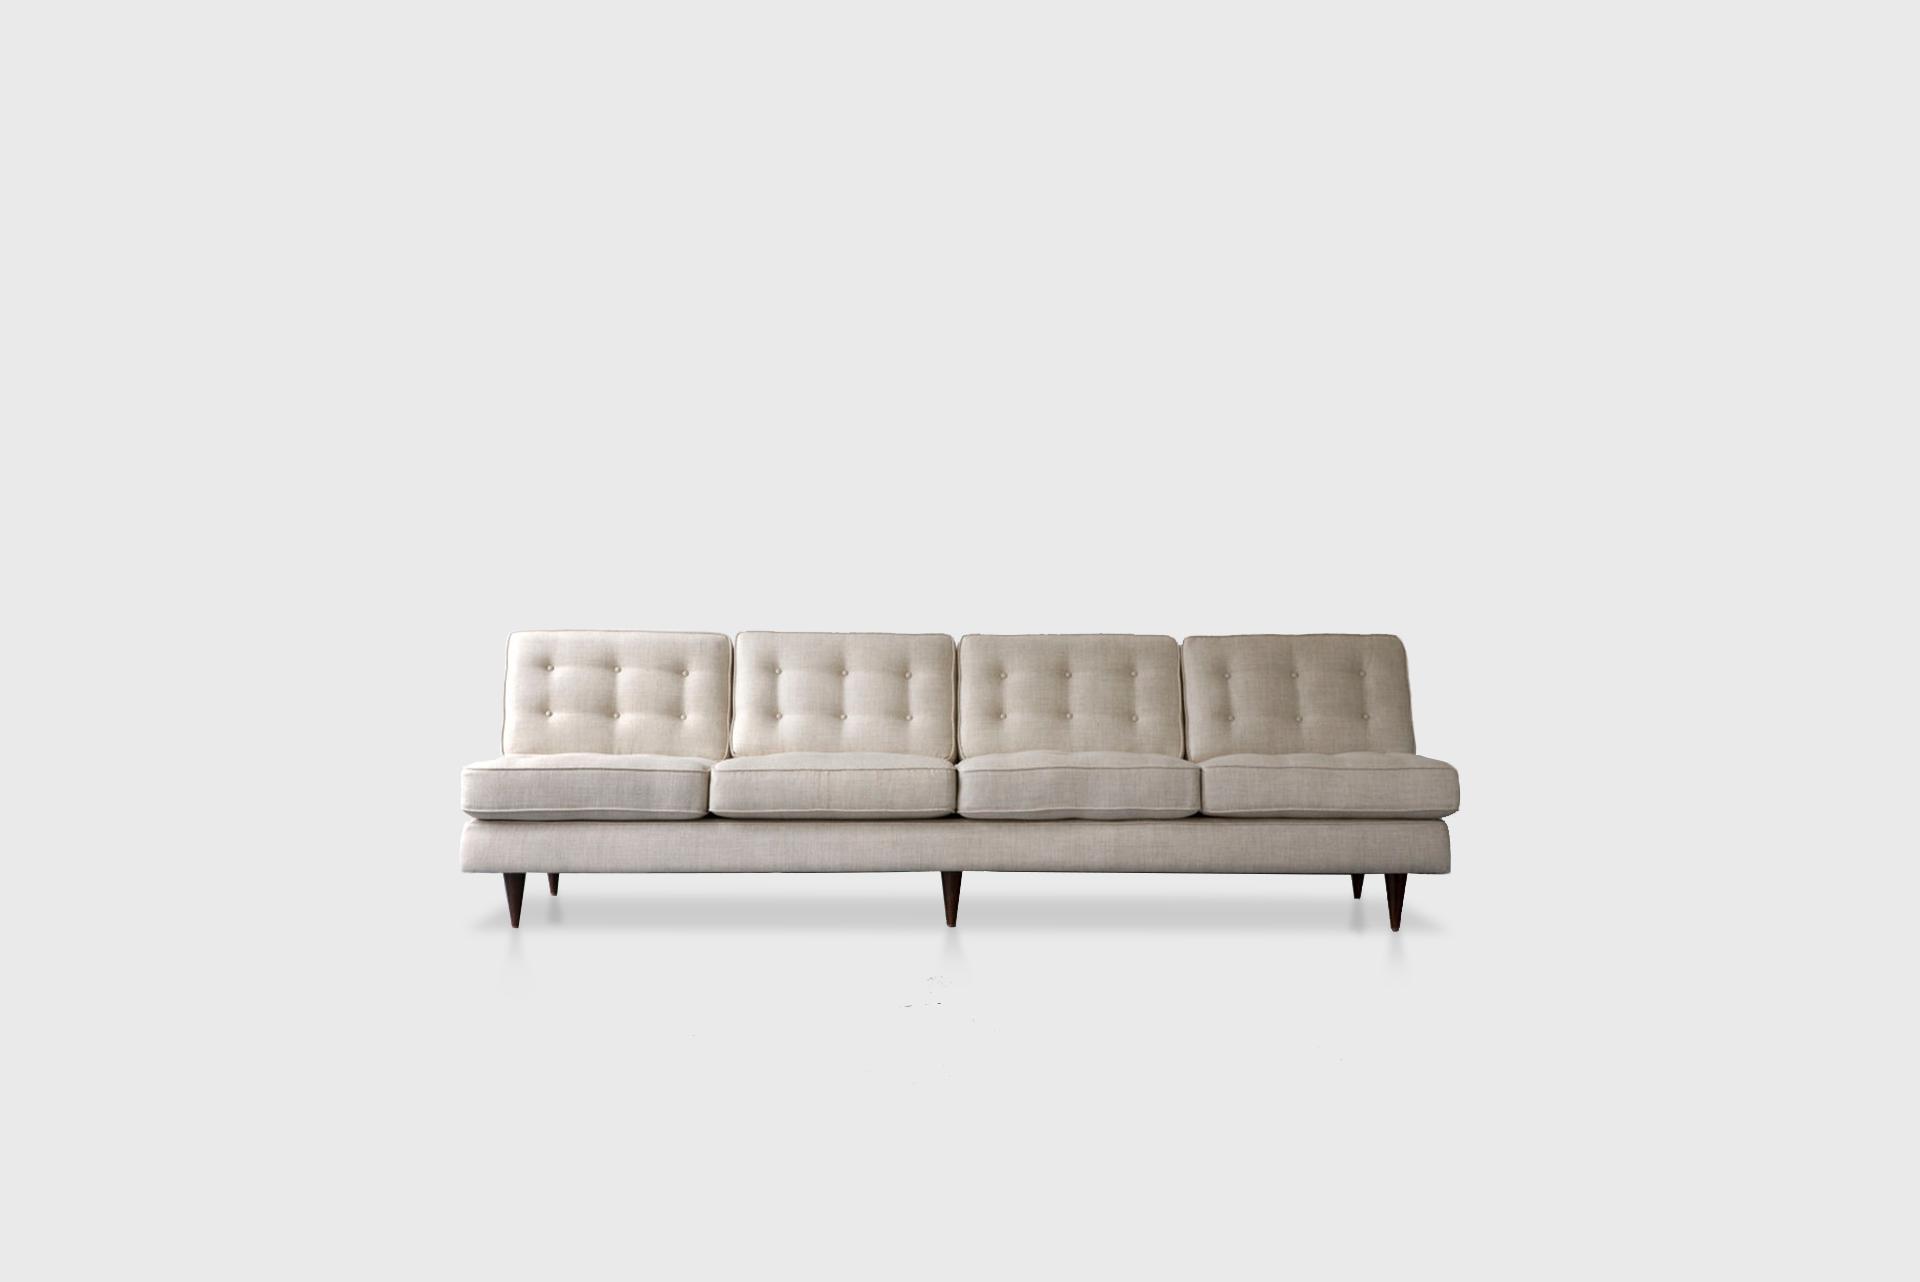 Four-seat sofa Manufactured by Tenreiro Moveis e Decoraçaos Brazil, 1950s Wood, upholstery